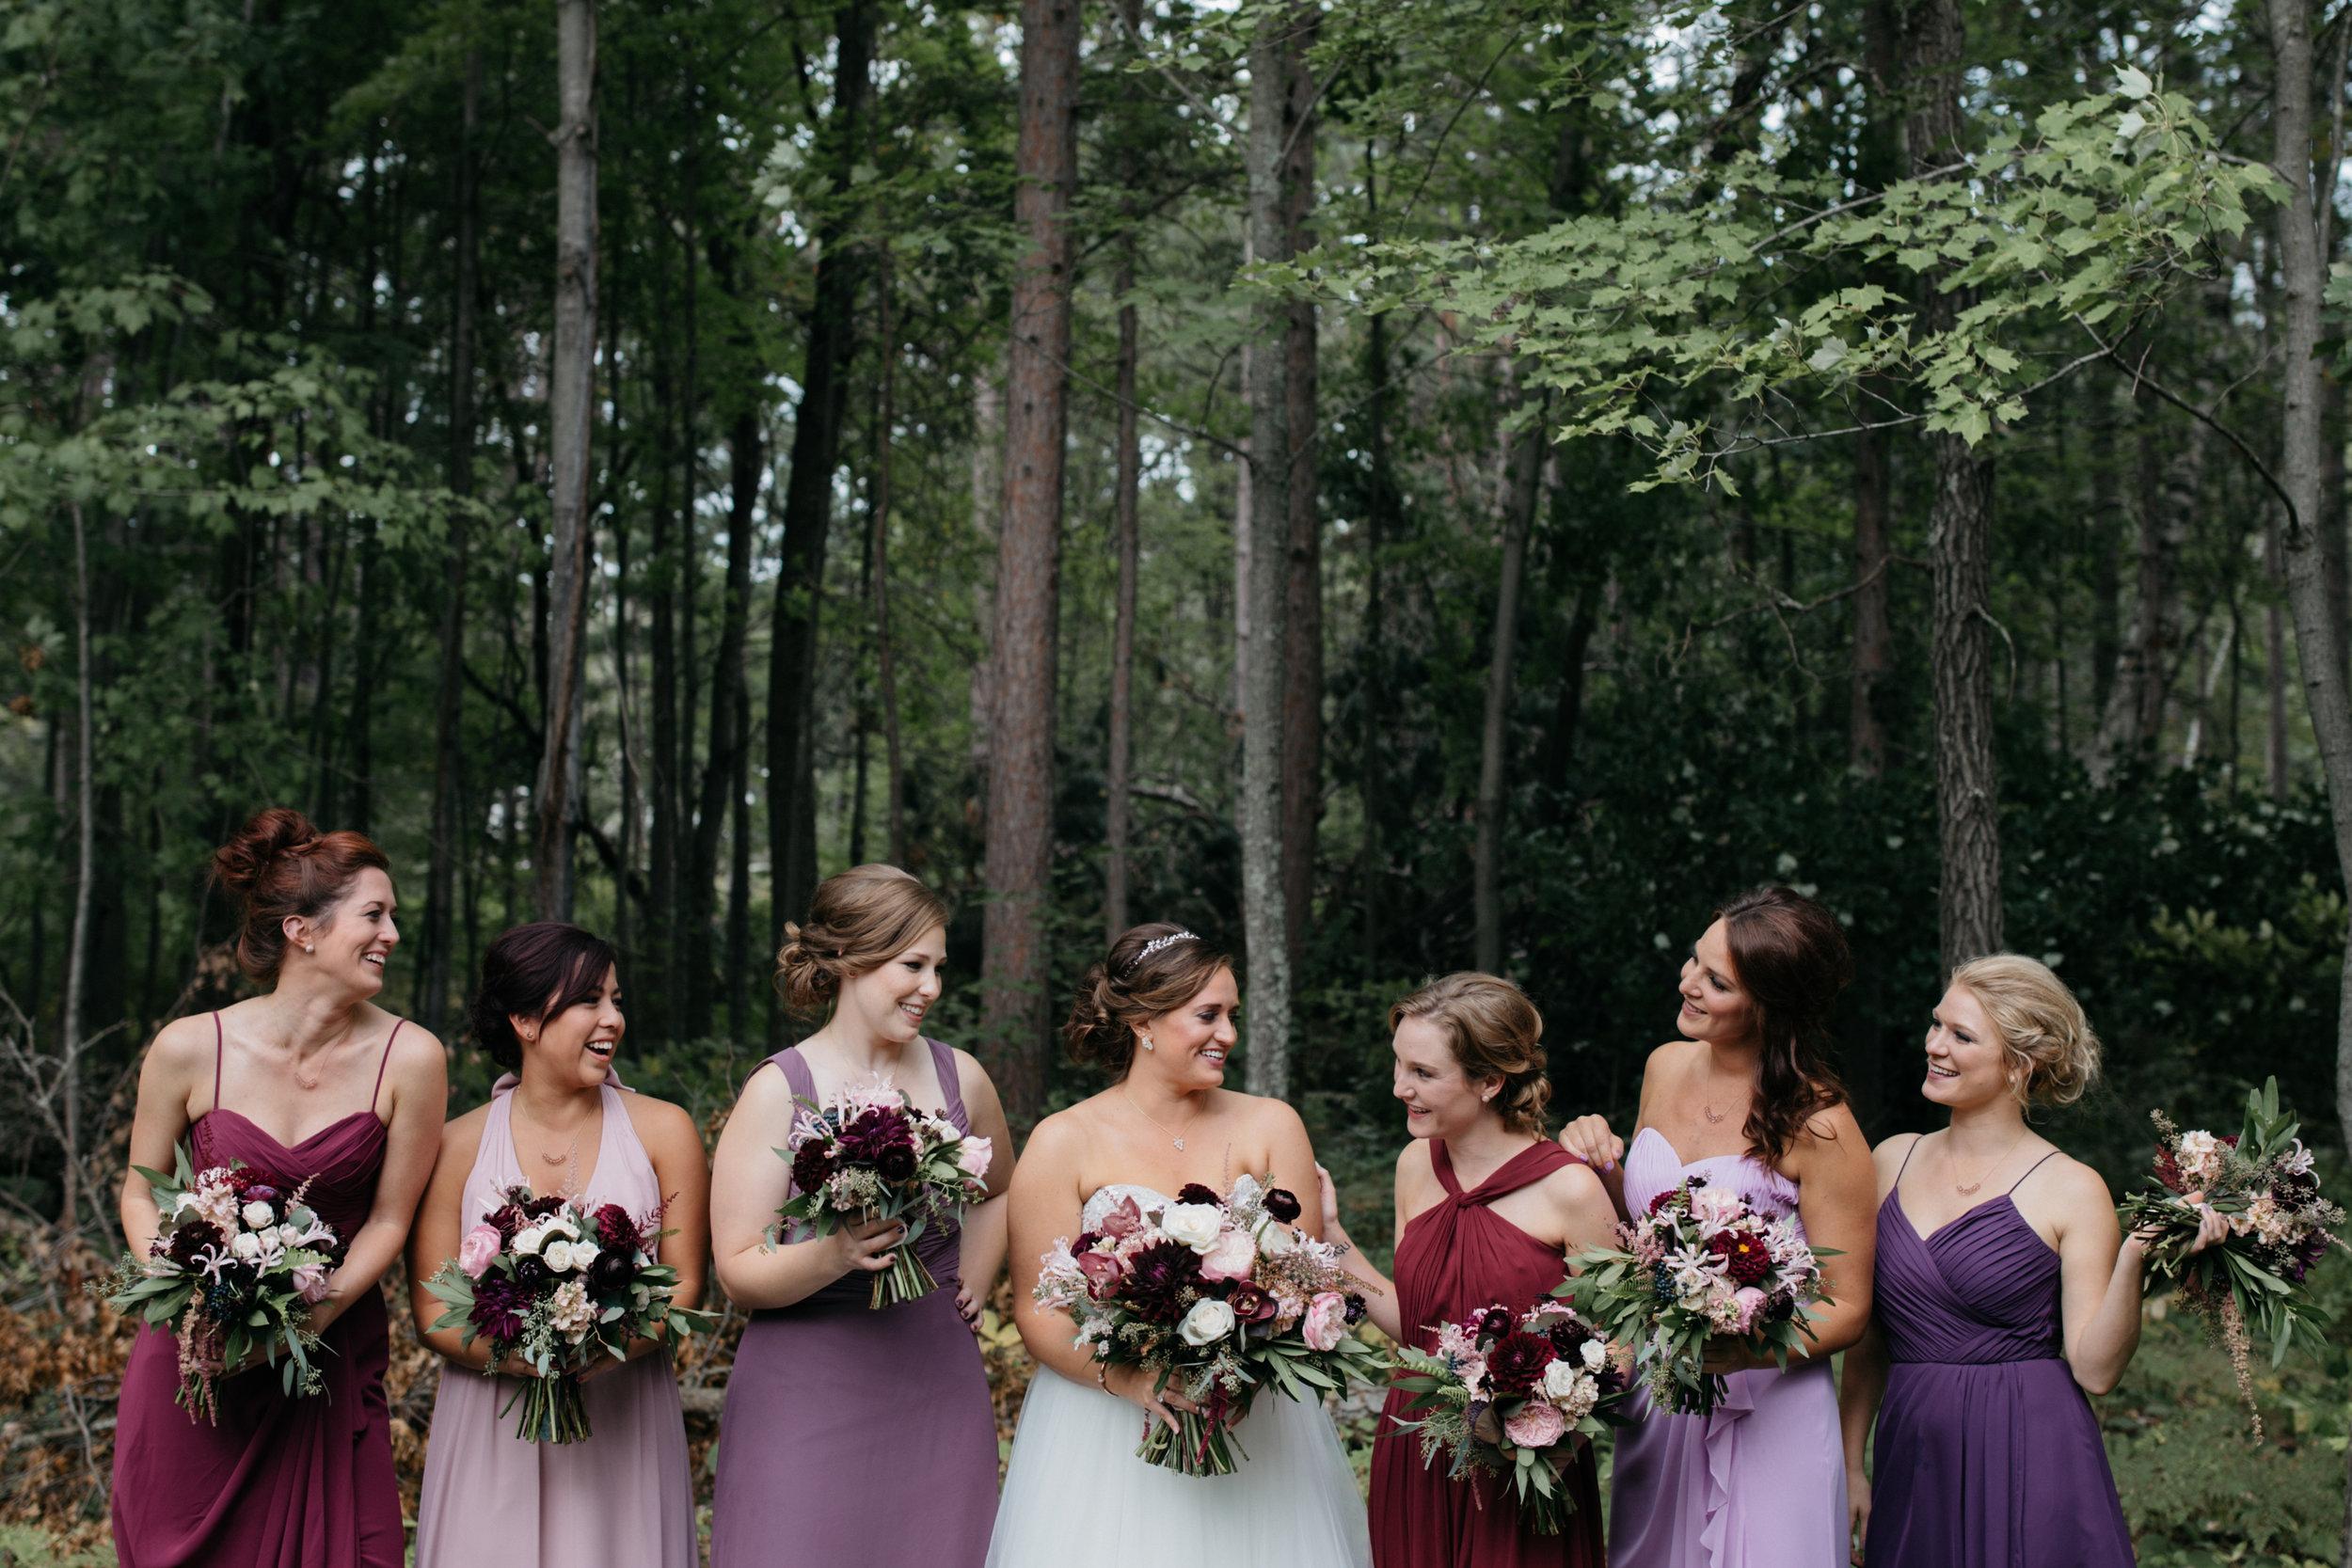 Stunning summer wedding at Grand View Lodge, photography by Britt DeZeeuw